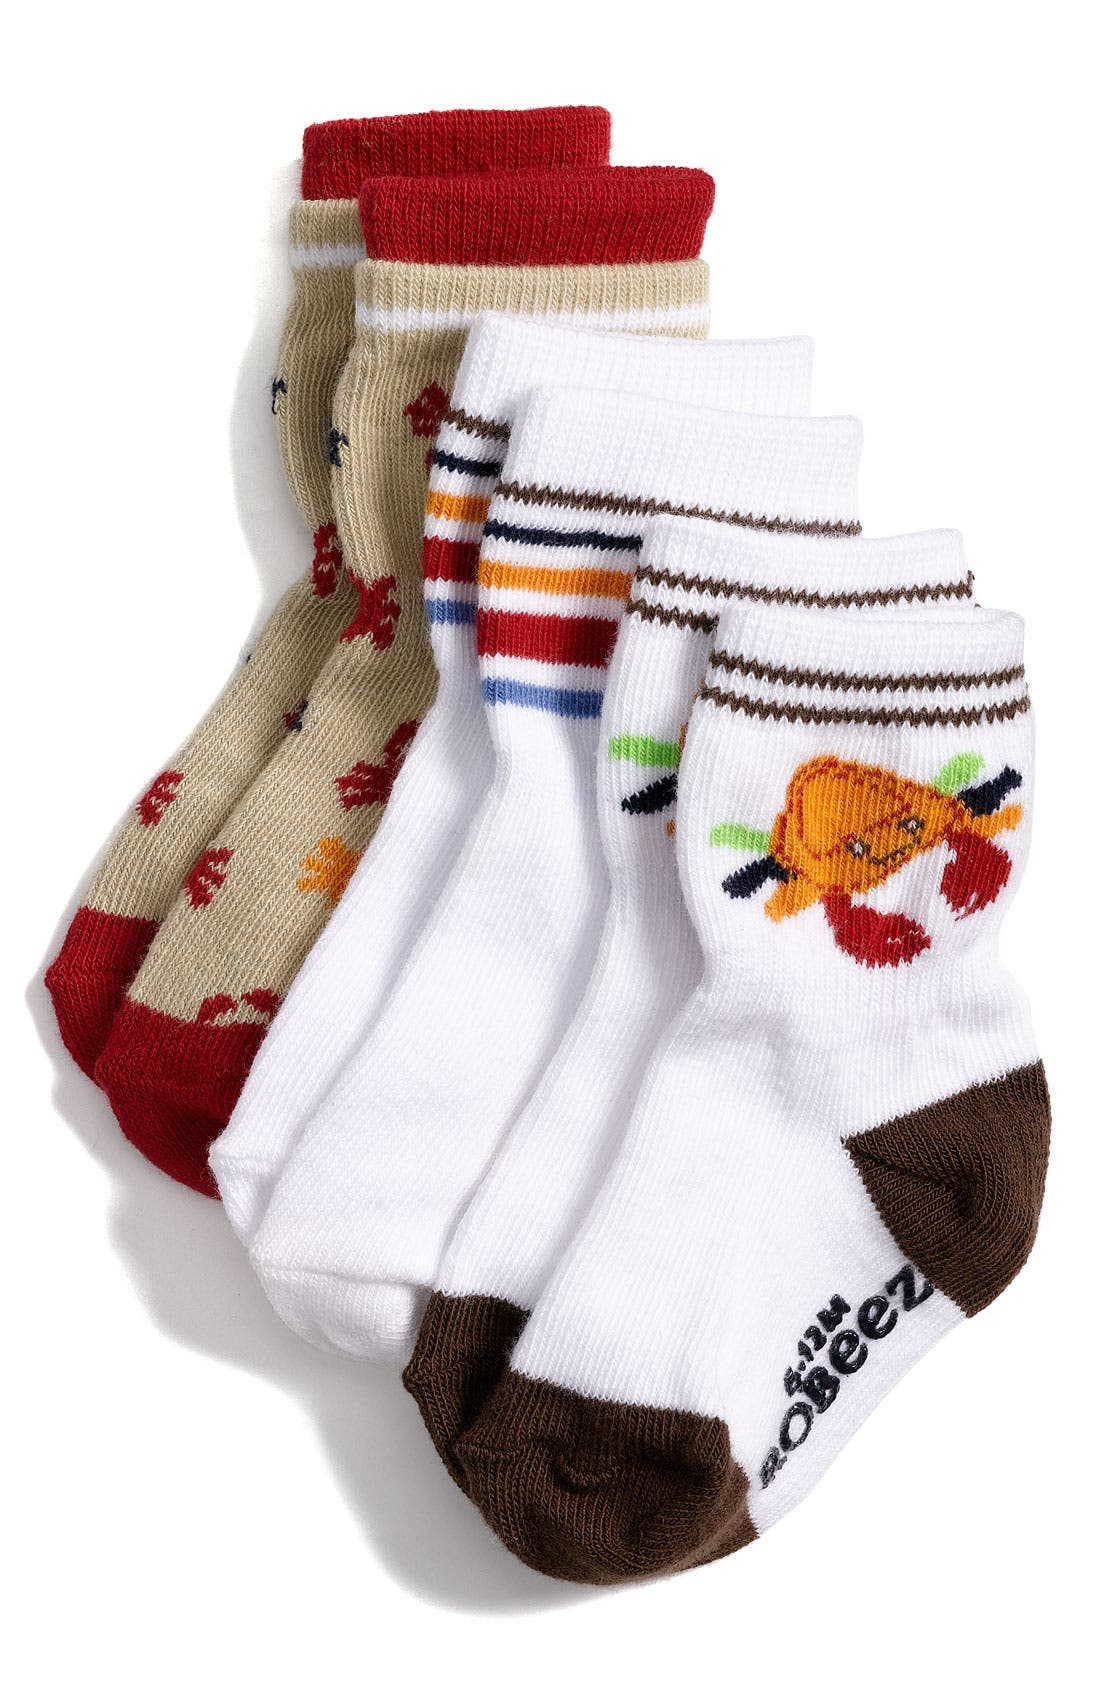 Alternate Image 1 Selected - Robeez® 'Crab' Socks (3-Pack) (Baby)